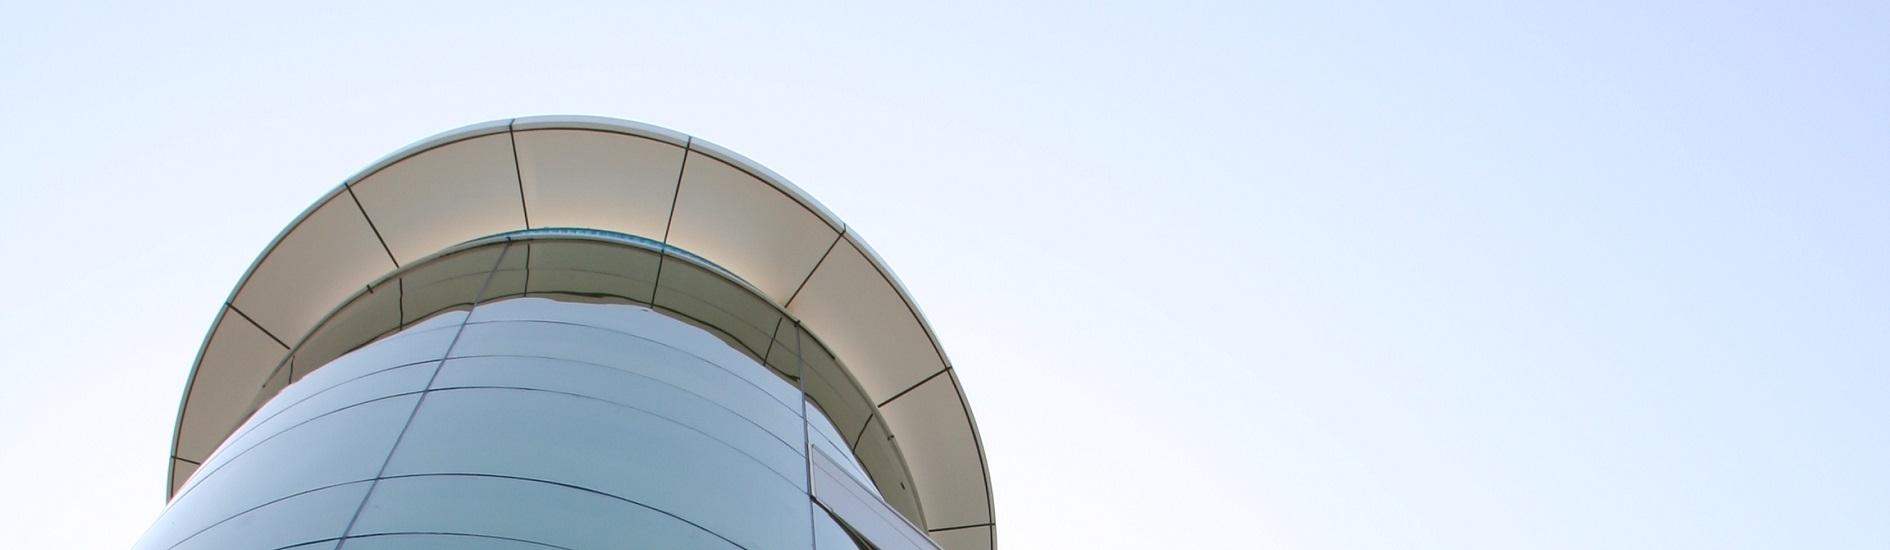 LAXTHA_Building_Circle_1890x550